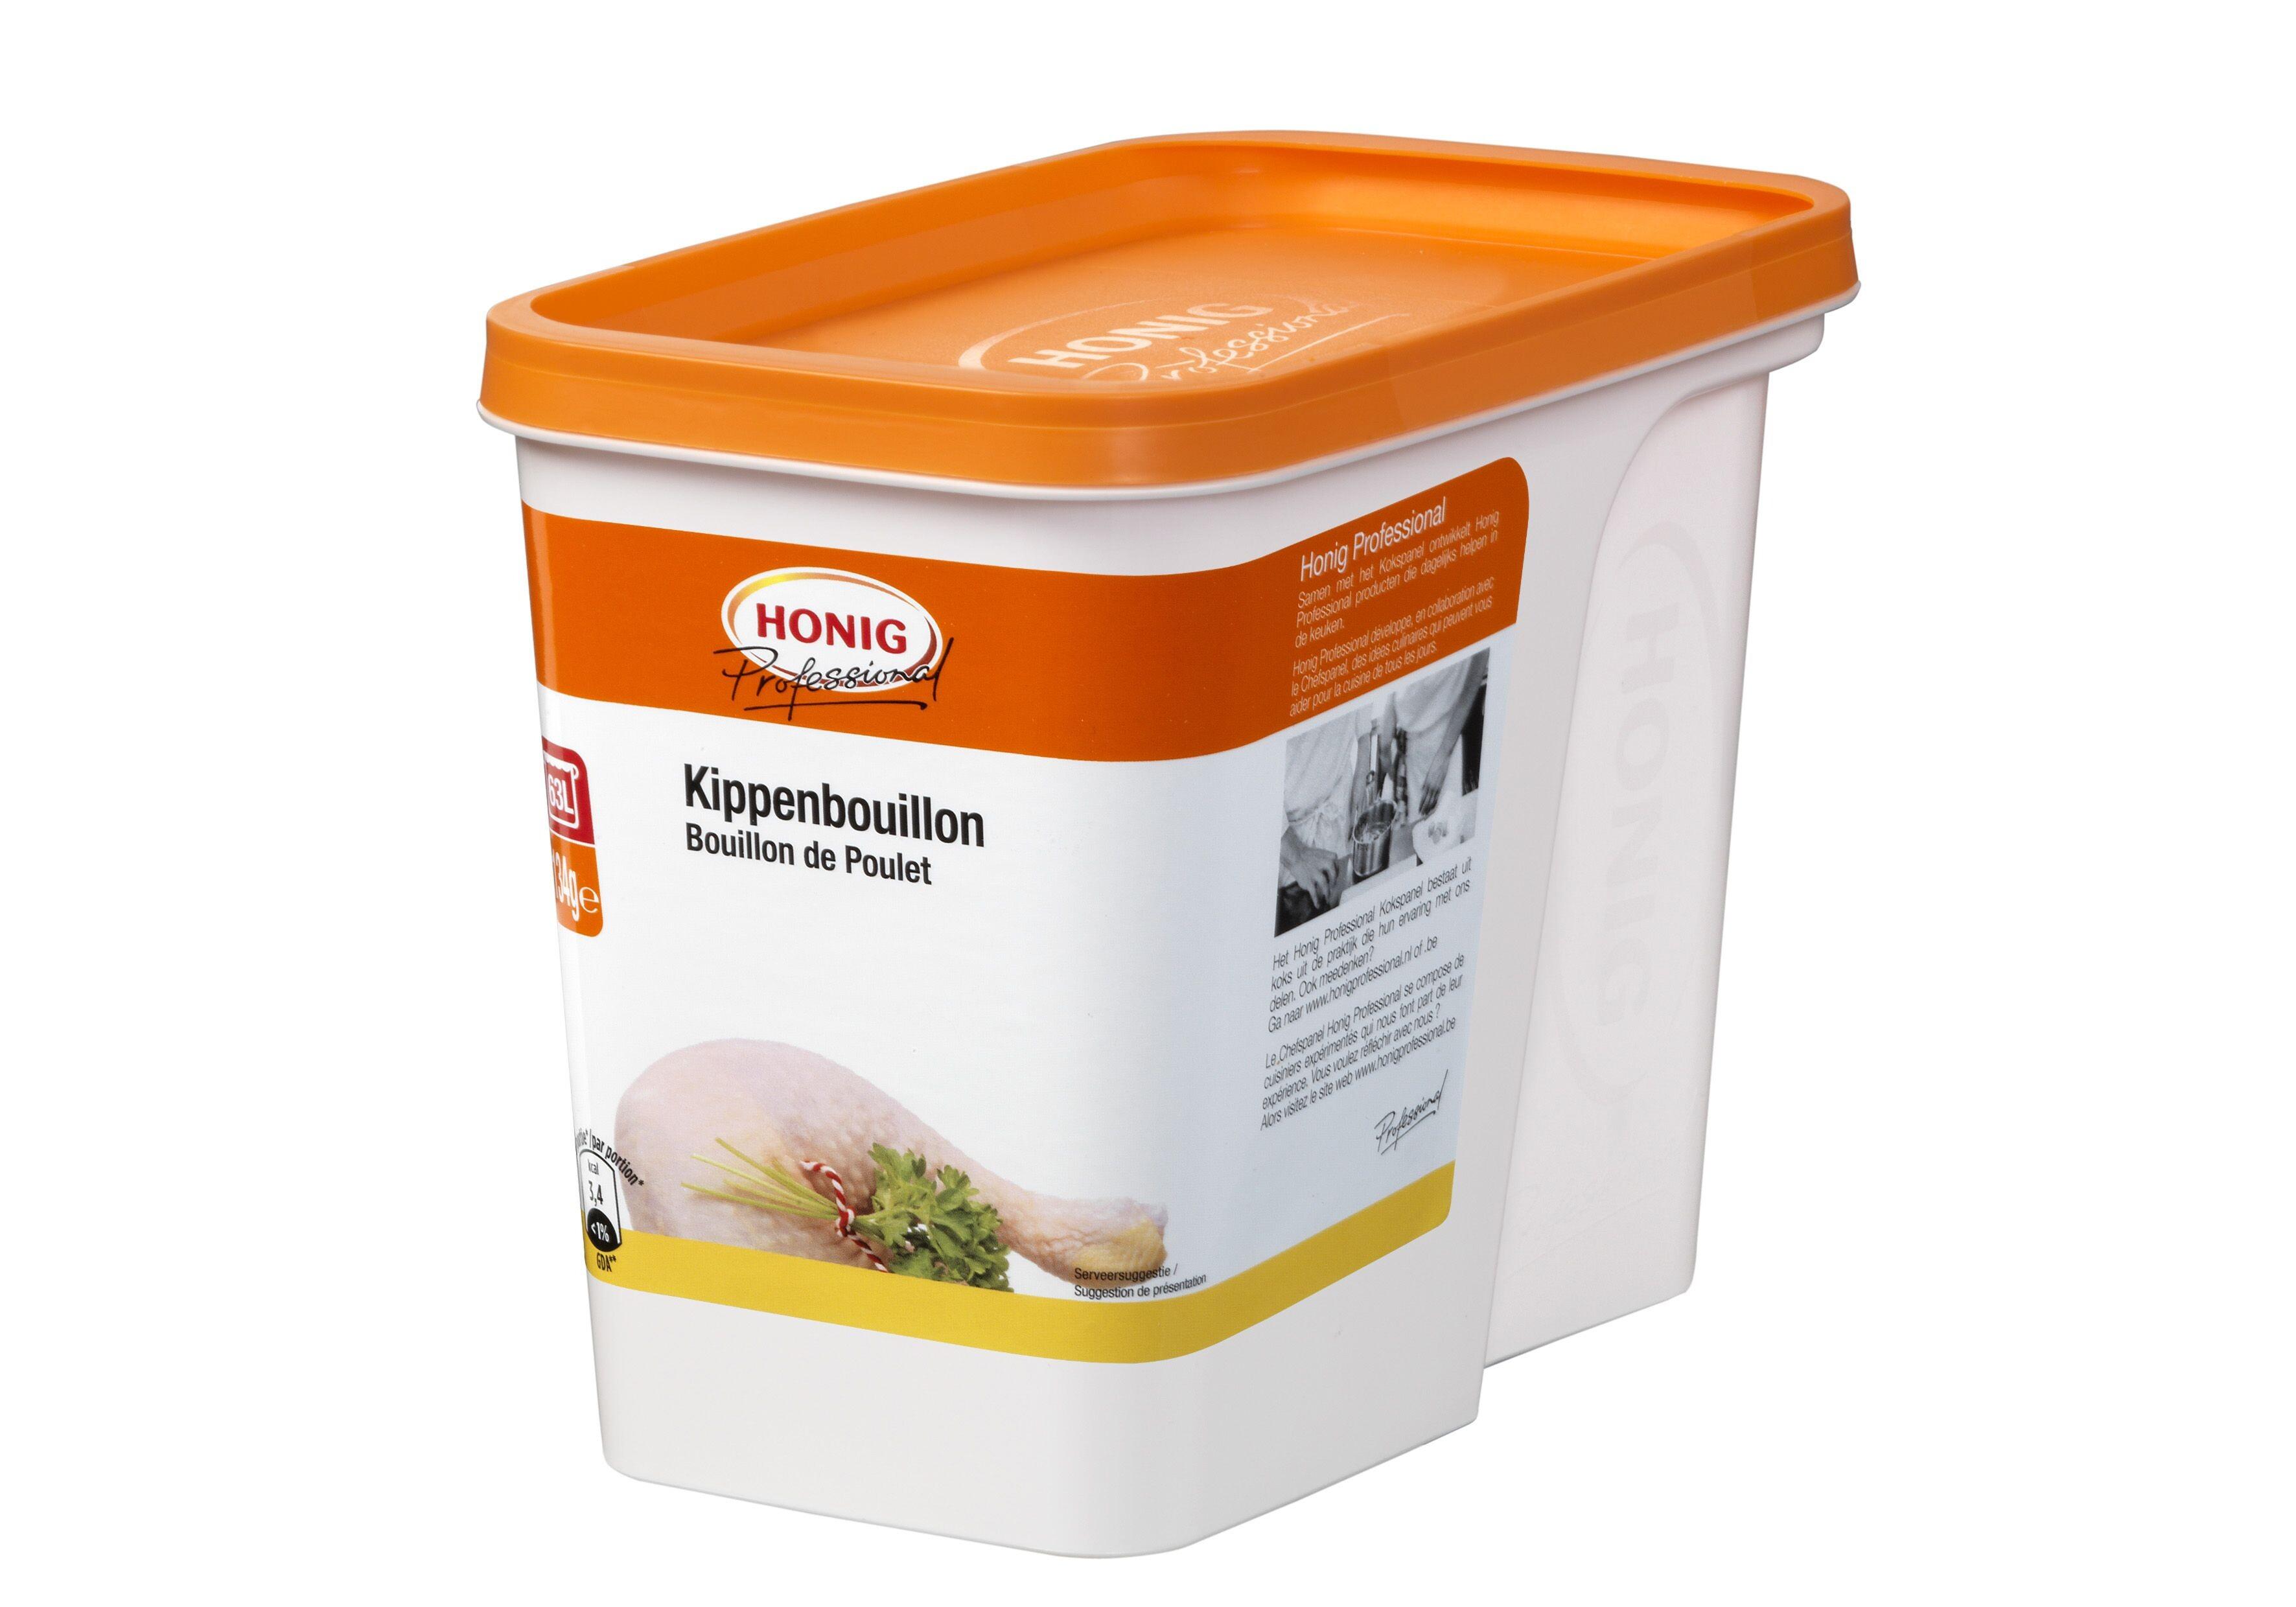 Honig chicken bouillon powder 1134gr Professional